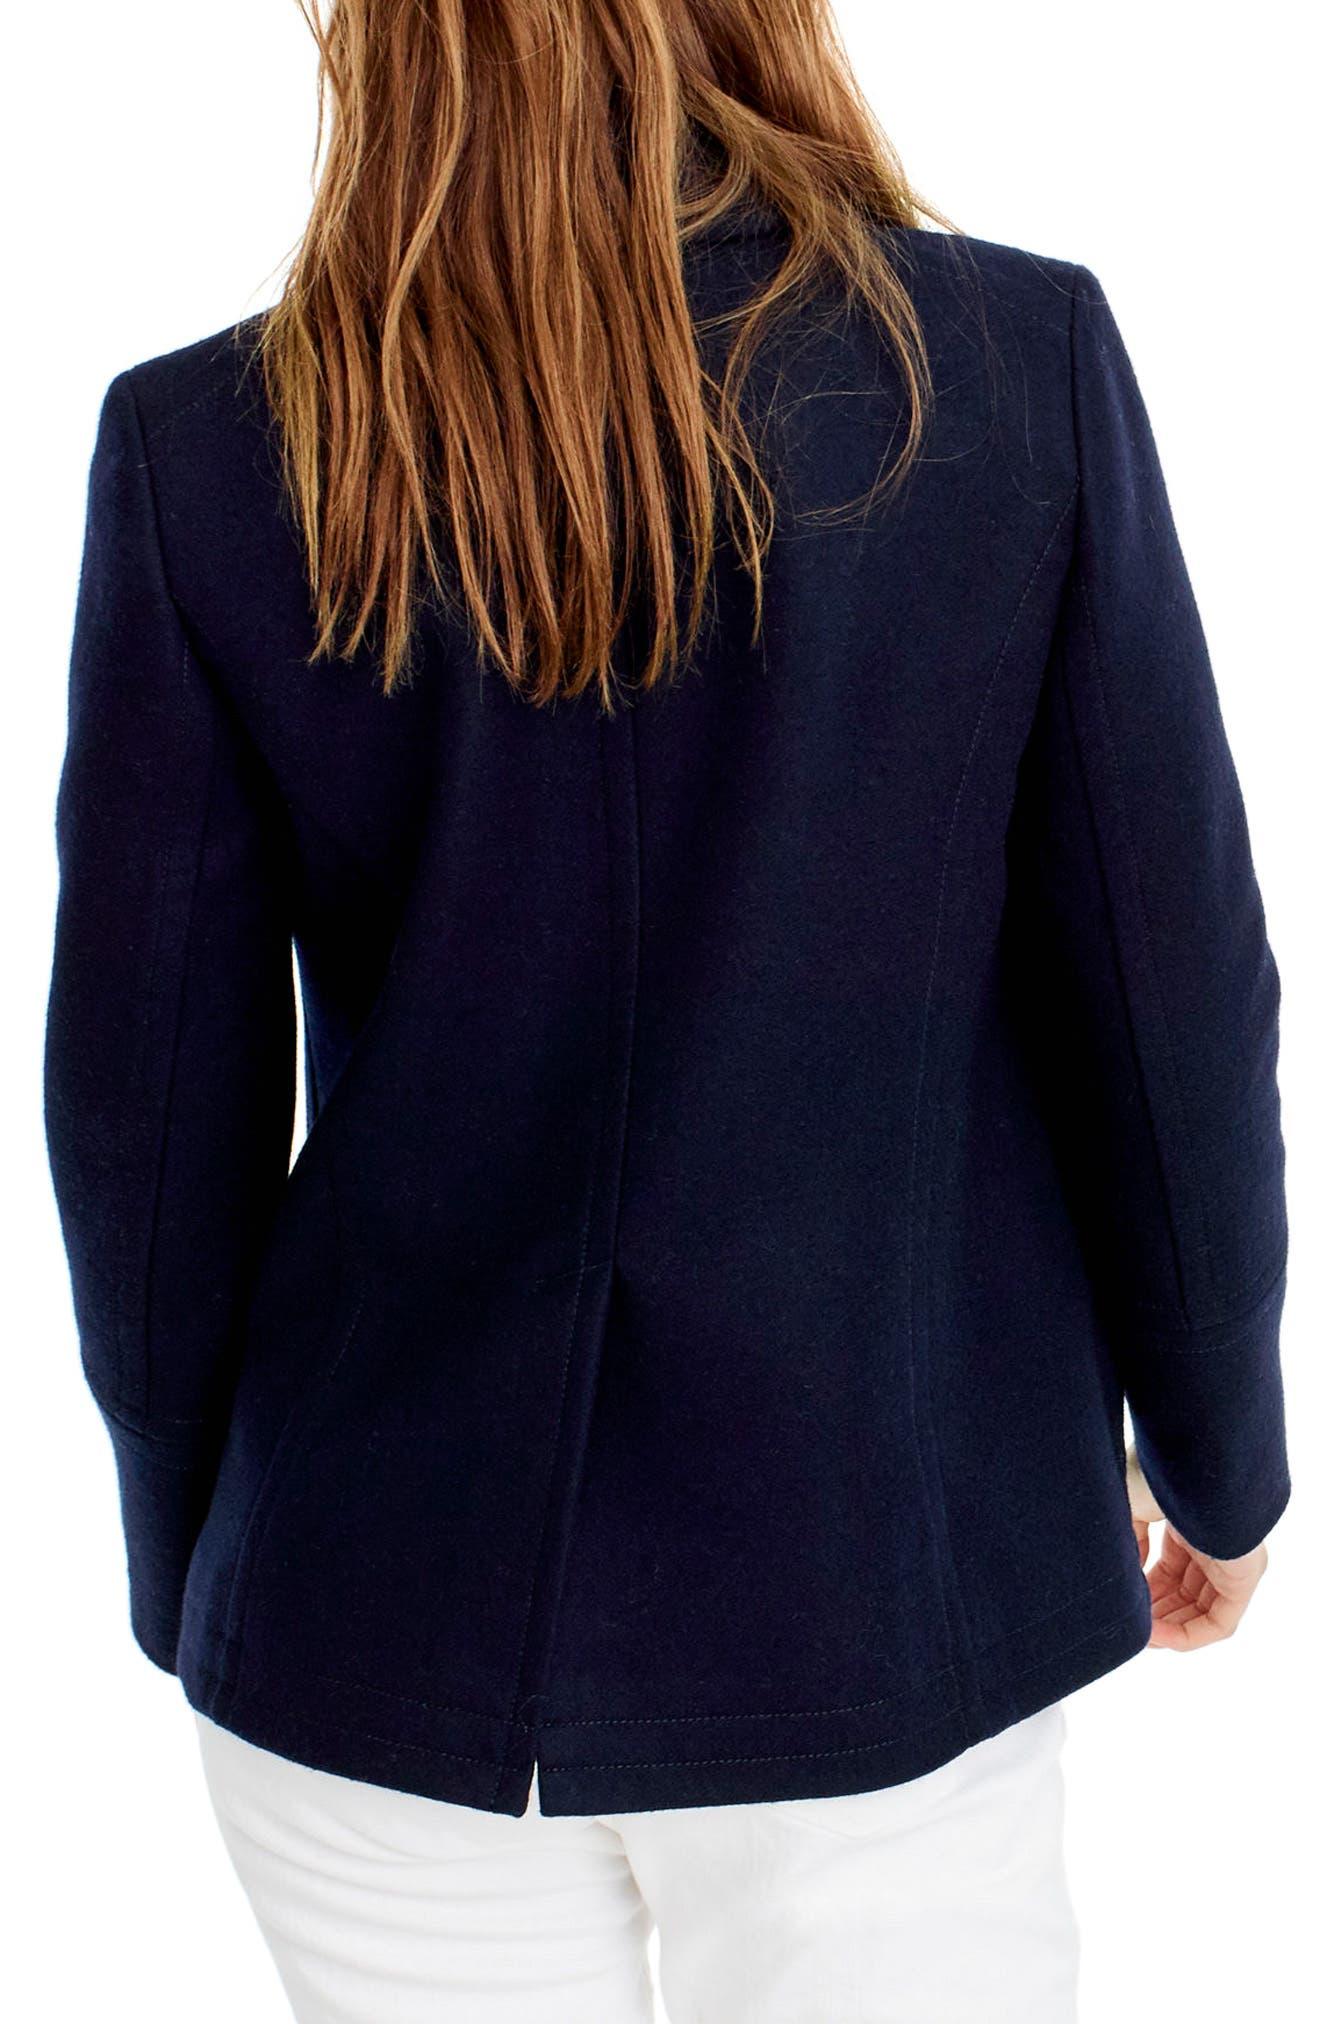 Alternate Image 2  - J.Crew Heritage Wool Blend Peacoat (Regular & Petite)